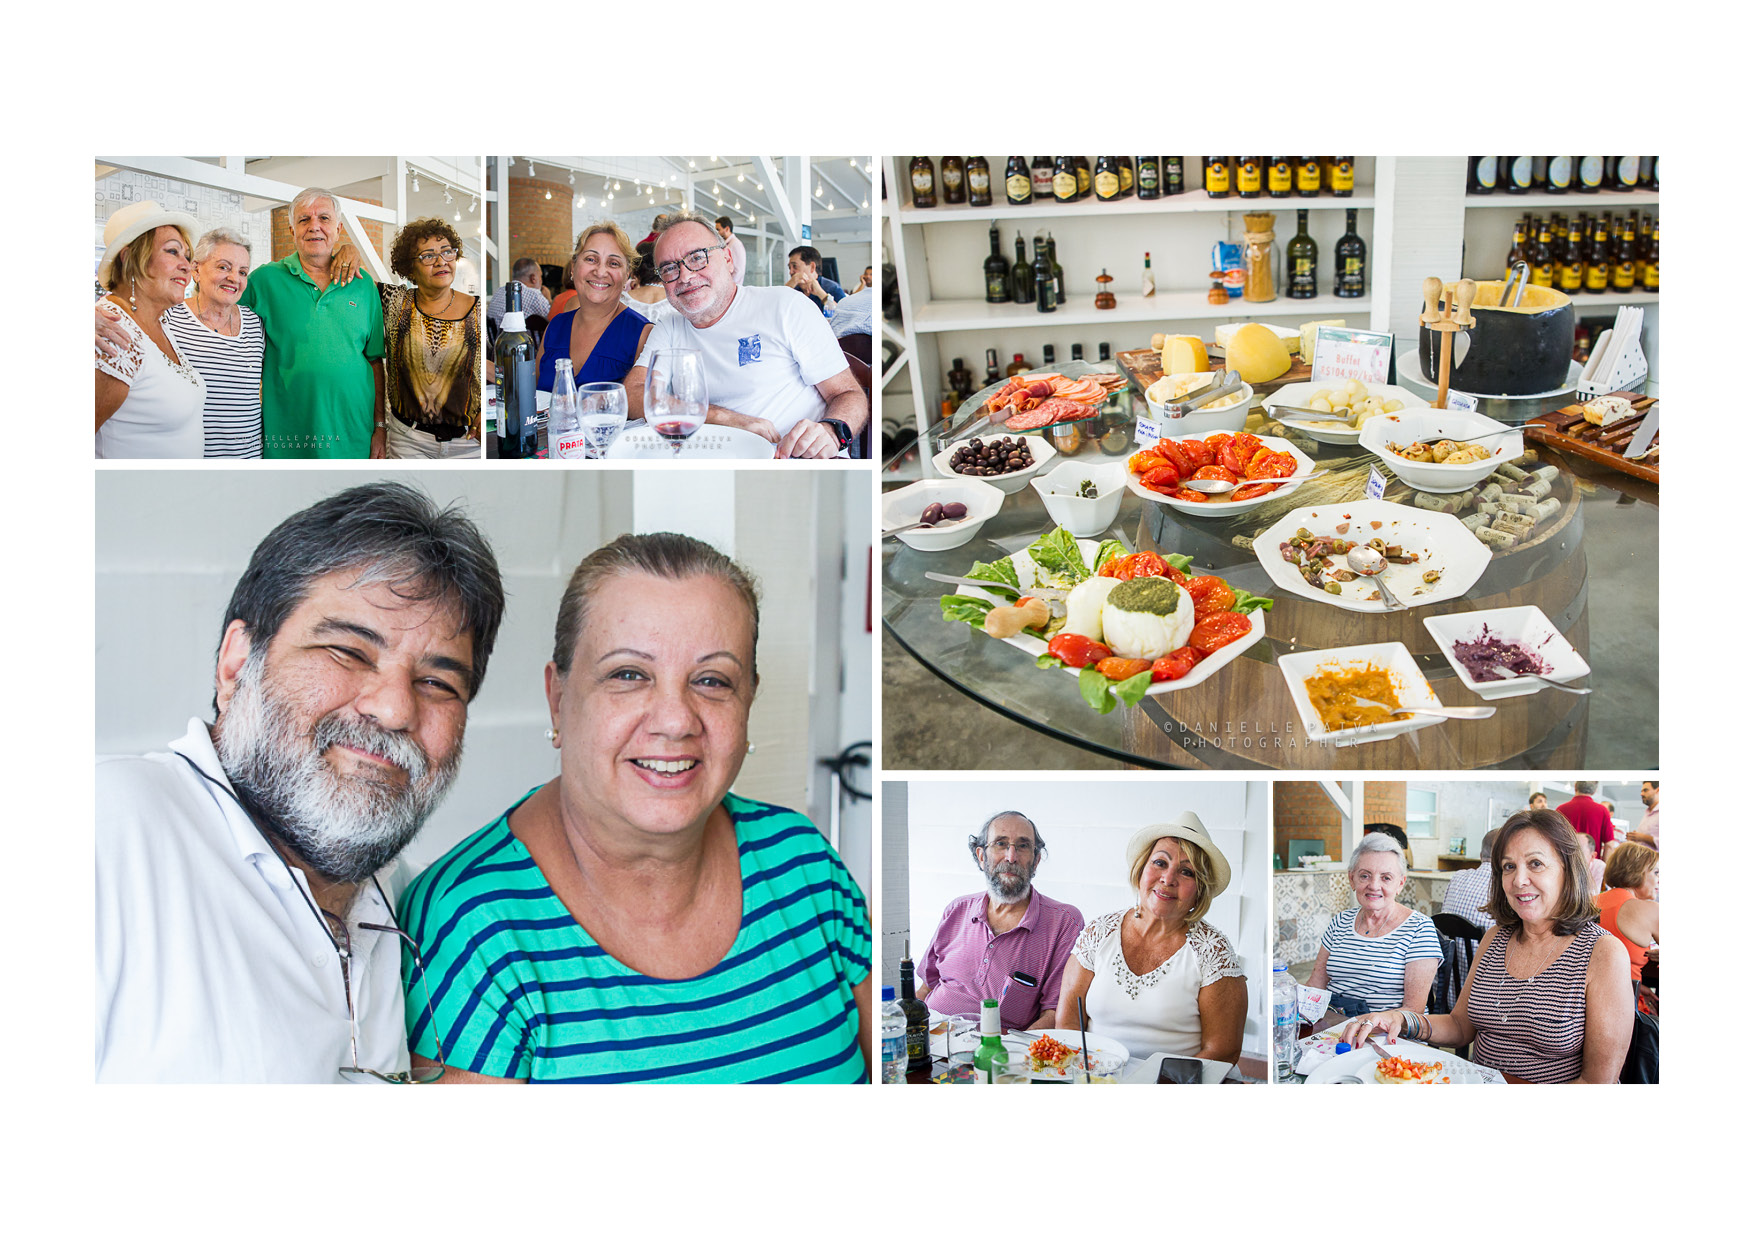 festa-niteroi-restaurante-eventos-tra-i-gusti-4